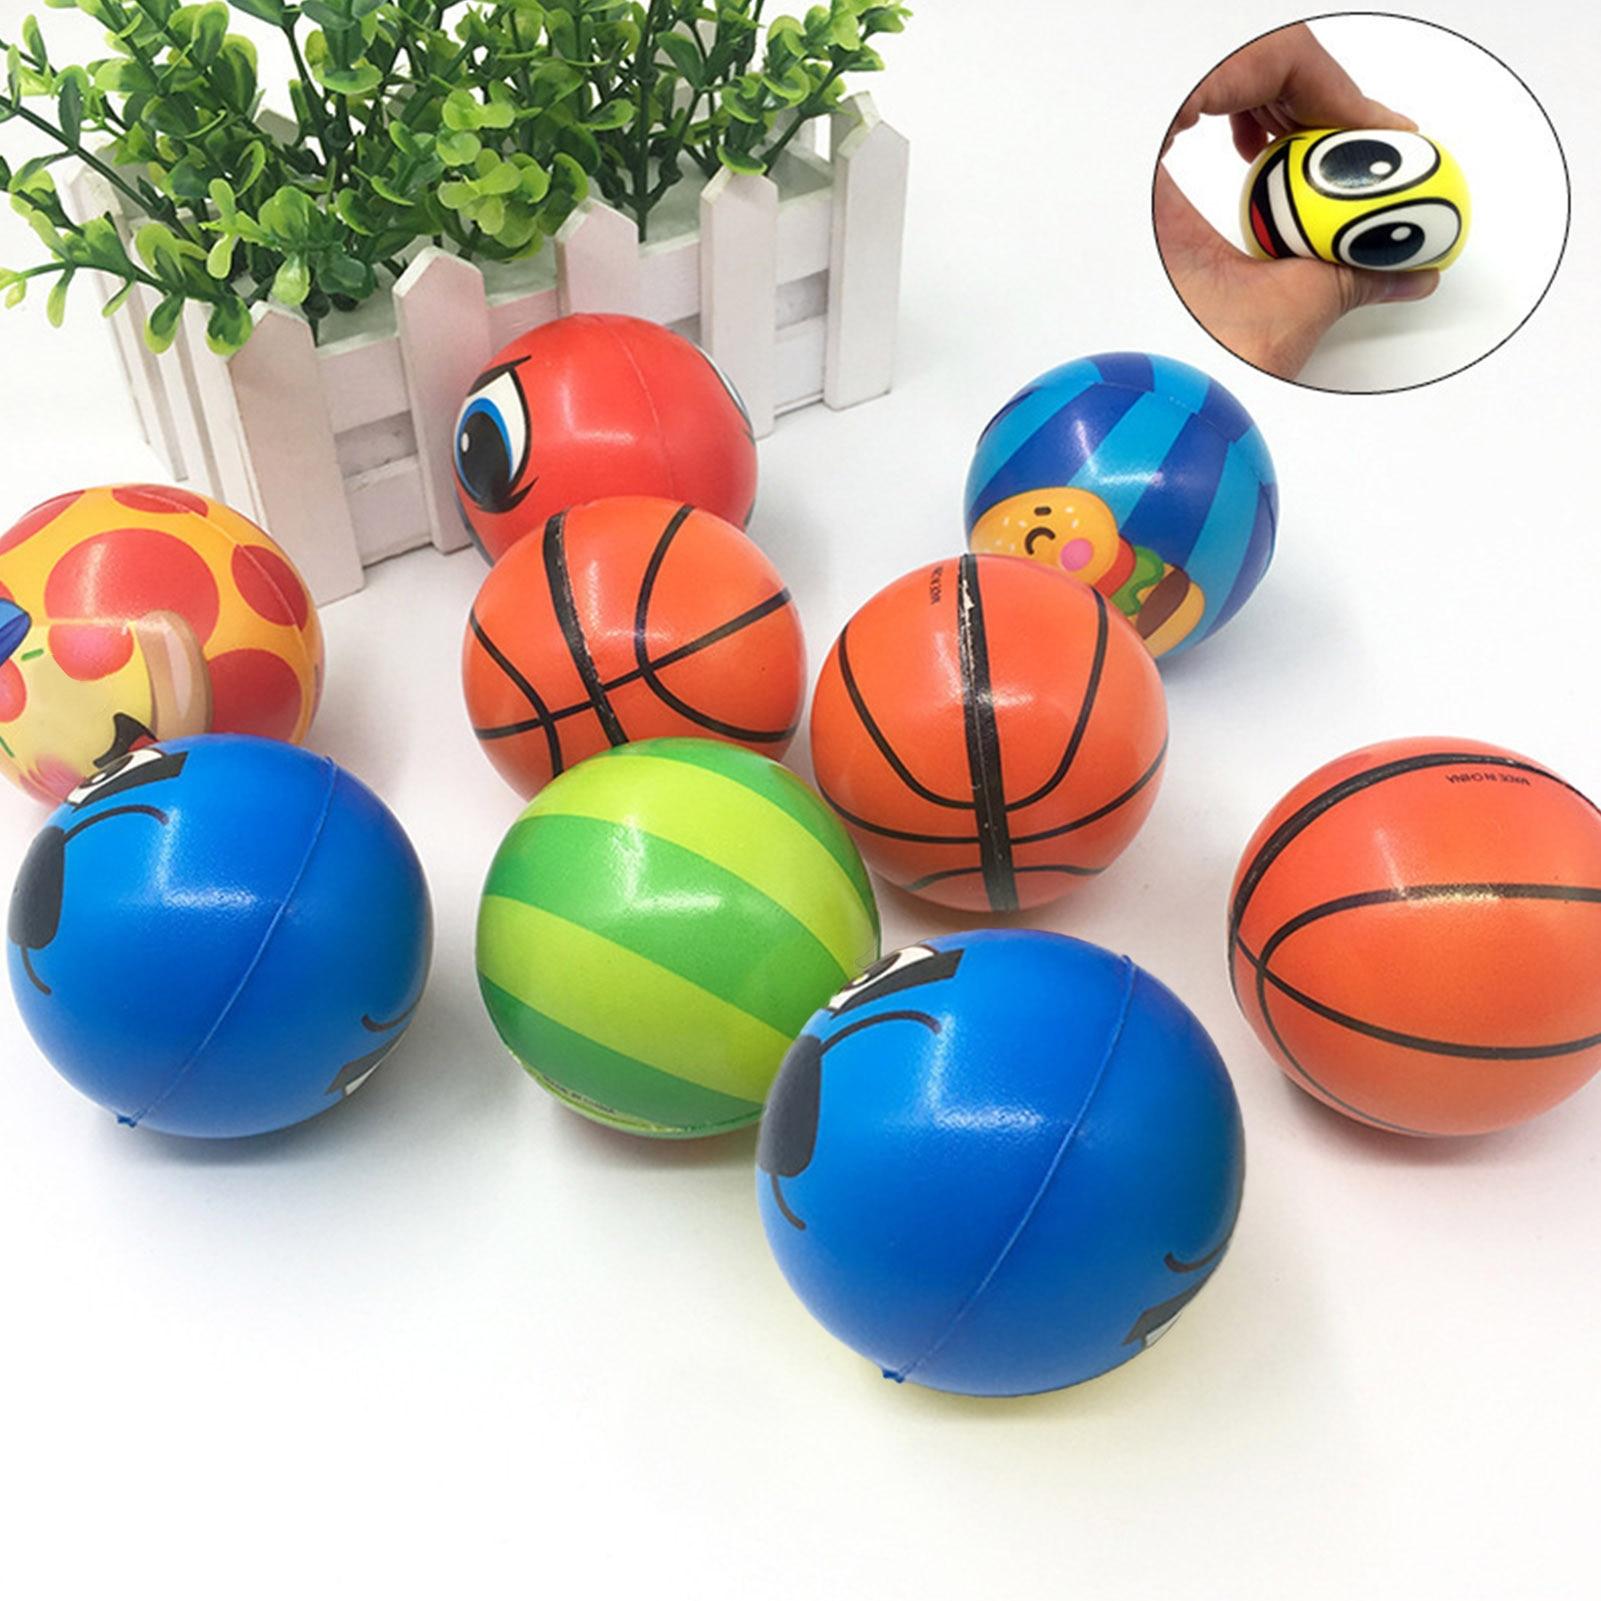 40PCS Fidget Toy Stress Relieve Balls Anti-Anxiety Sensory Toy ADHD Anxiety Relief Group Kids AntiStress Sensory Fidget Toys enlarge